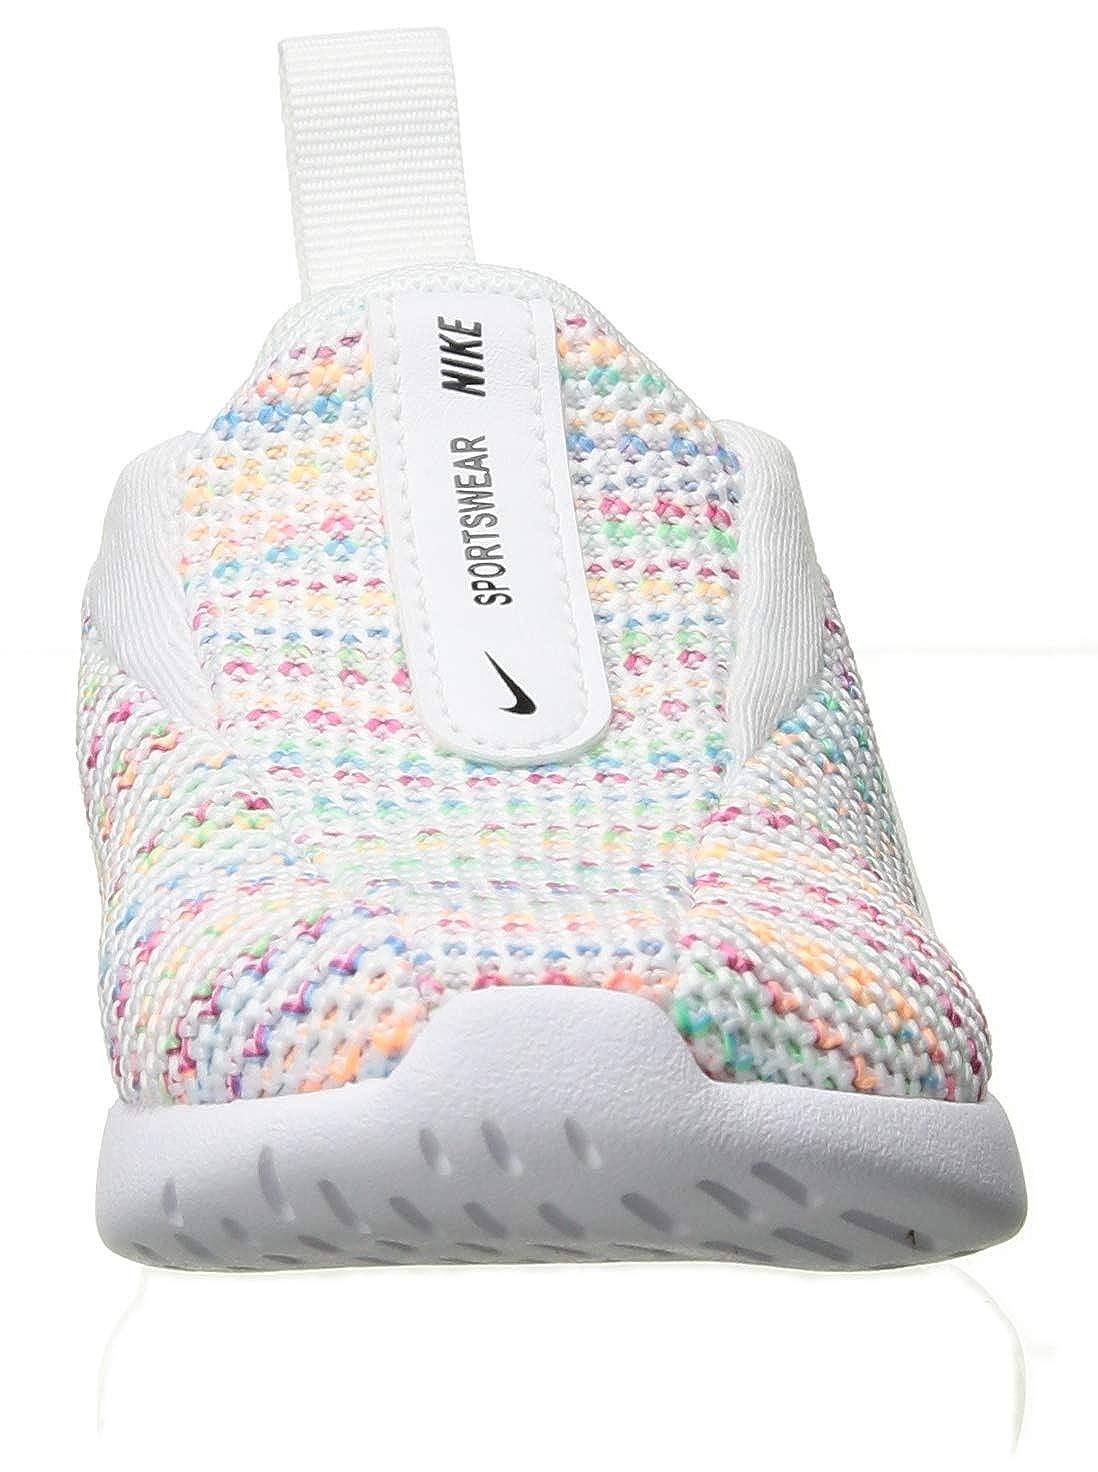 Sneaker Td Nike Kids Viale Space Dye